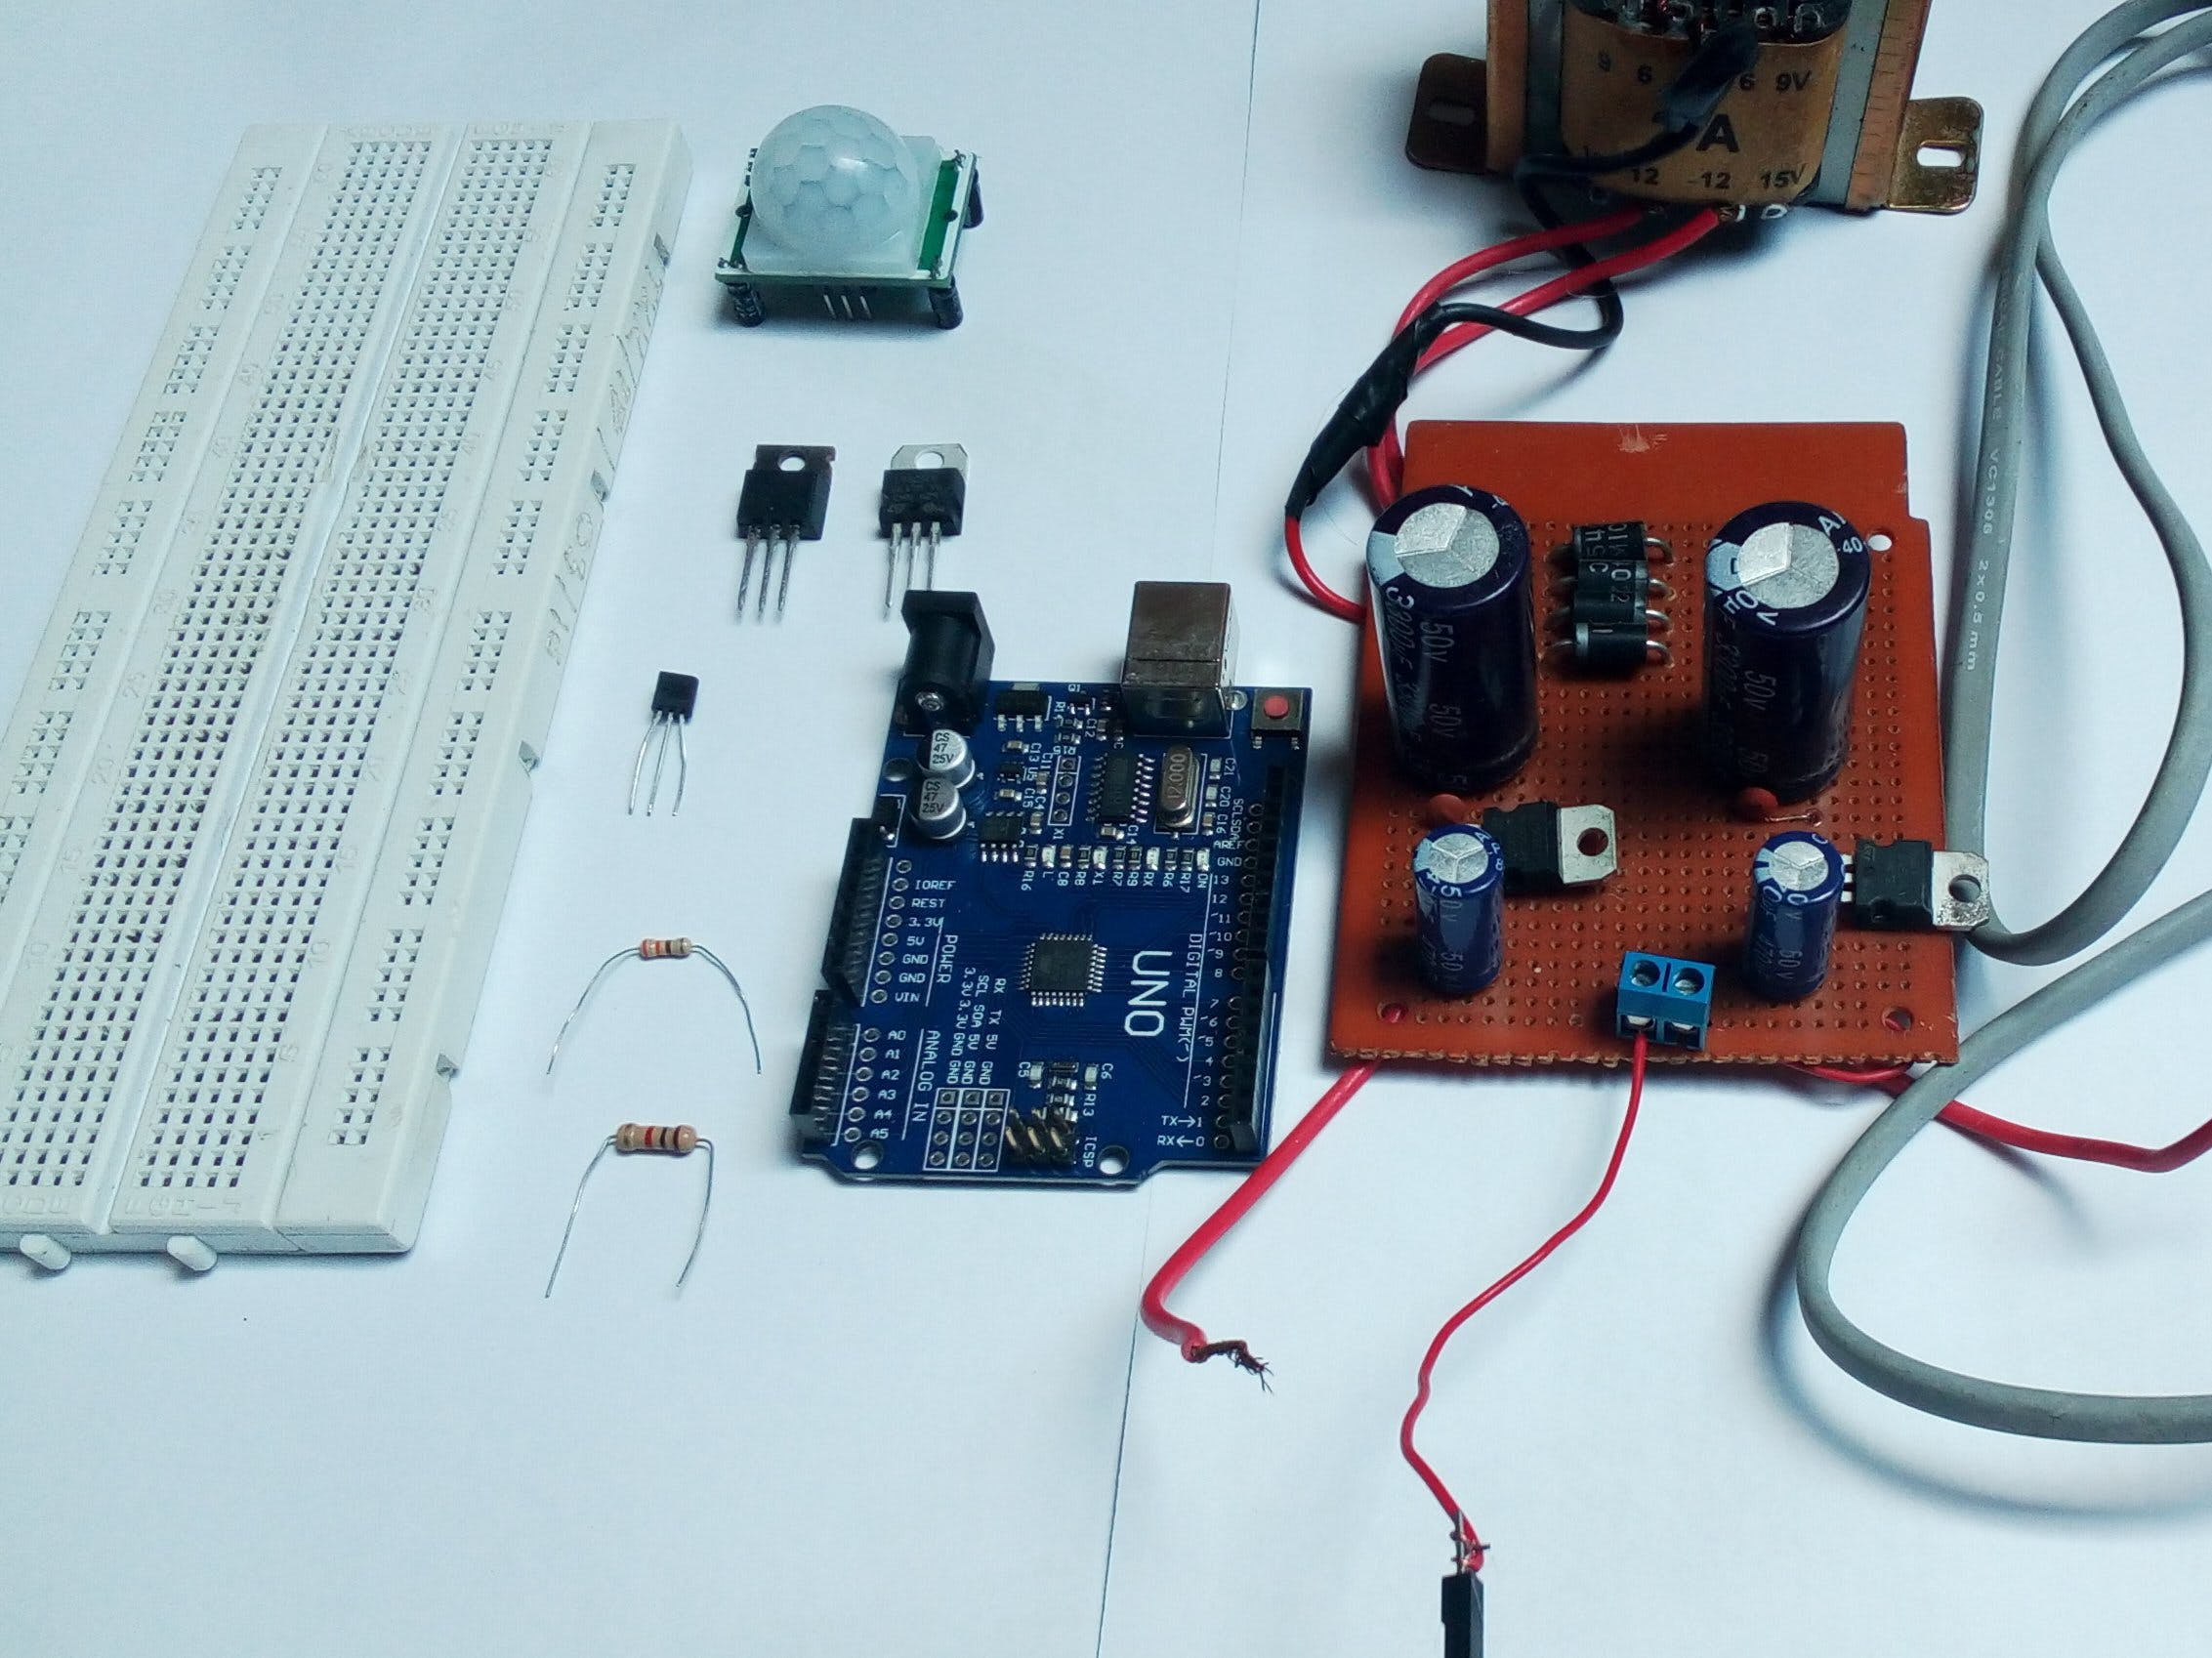 Automatic Fan with PIR Sensor and LM35 Sensor